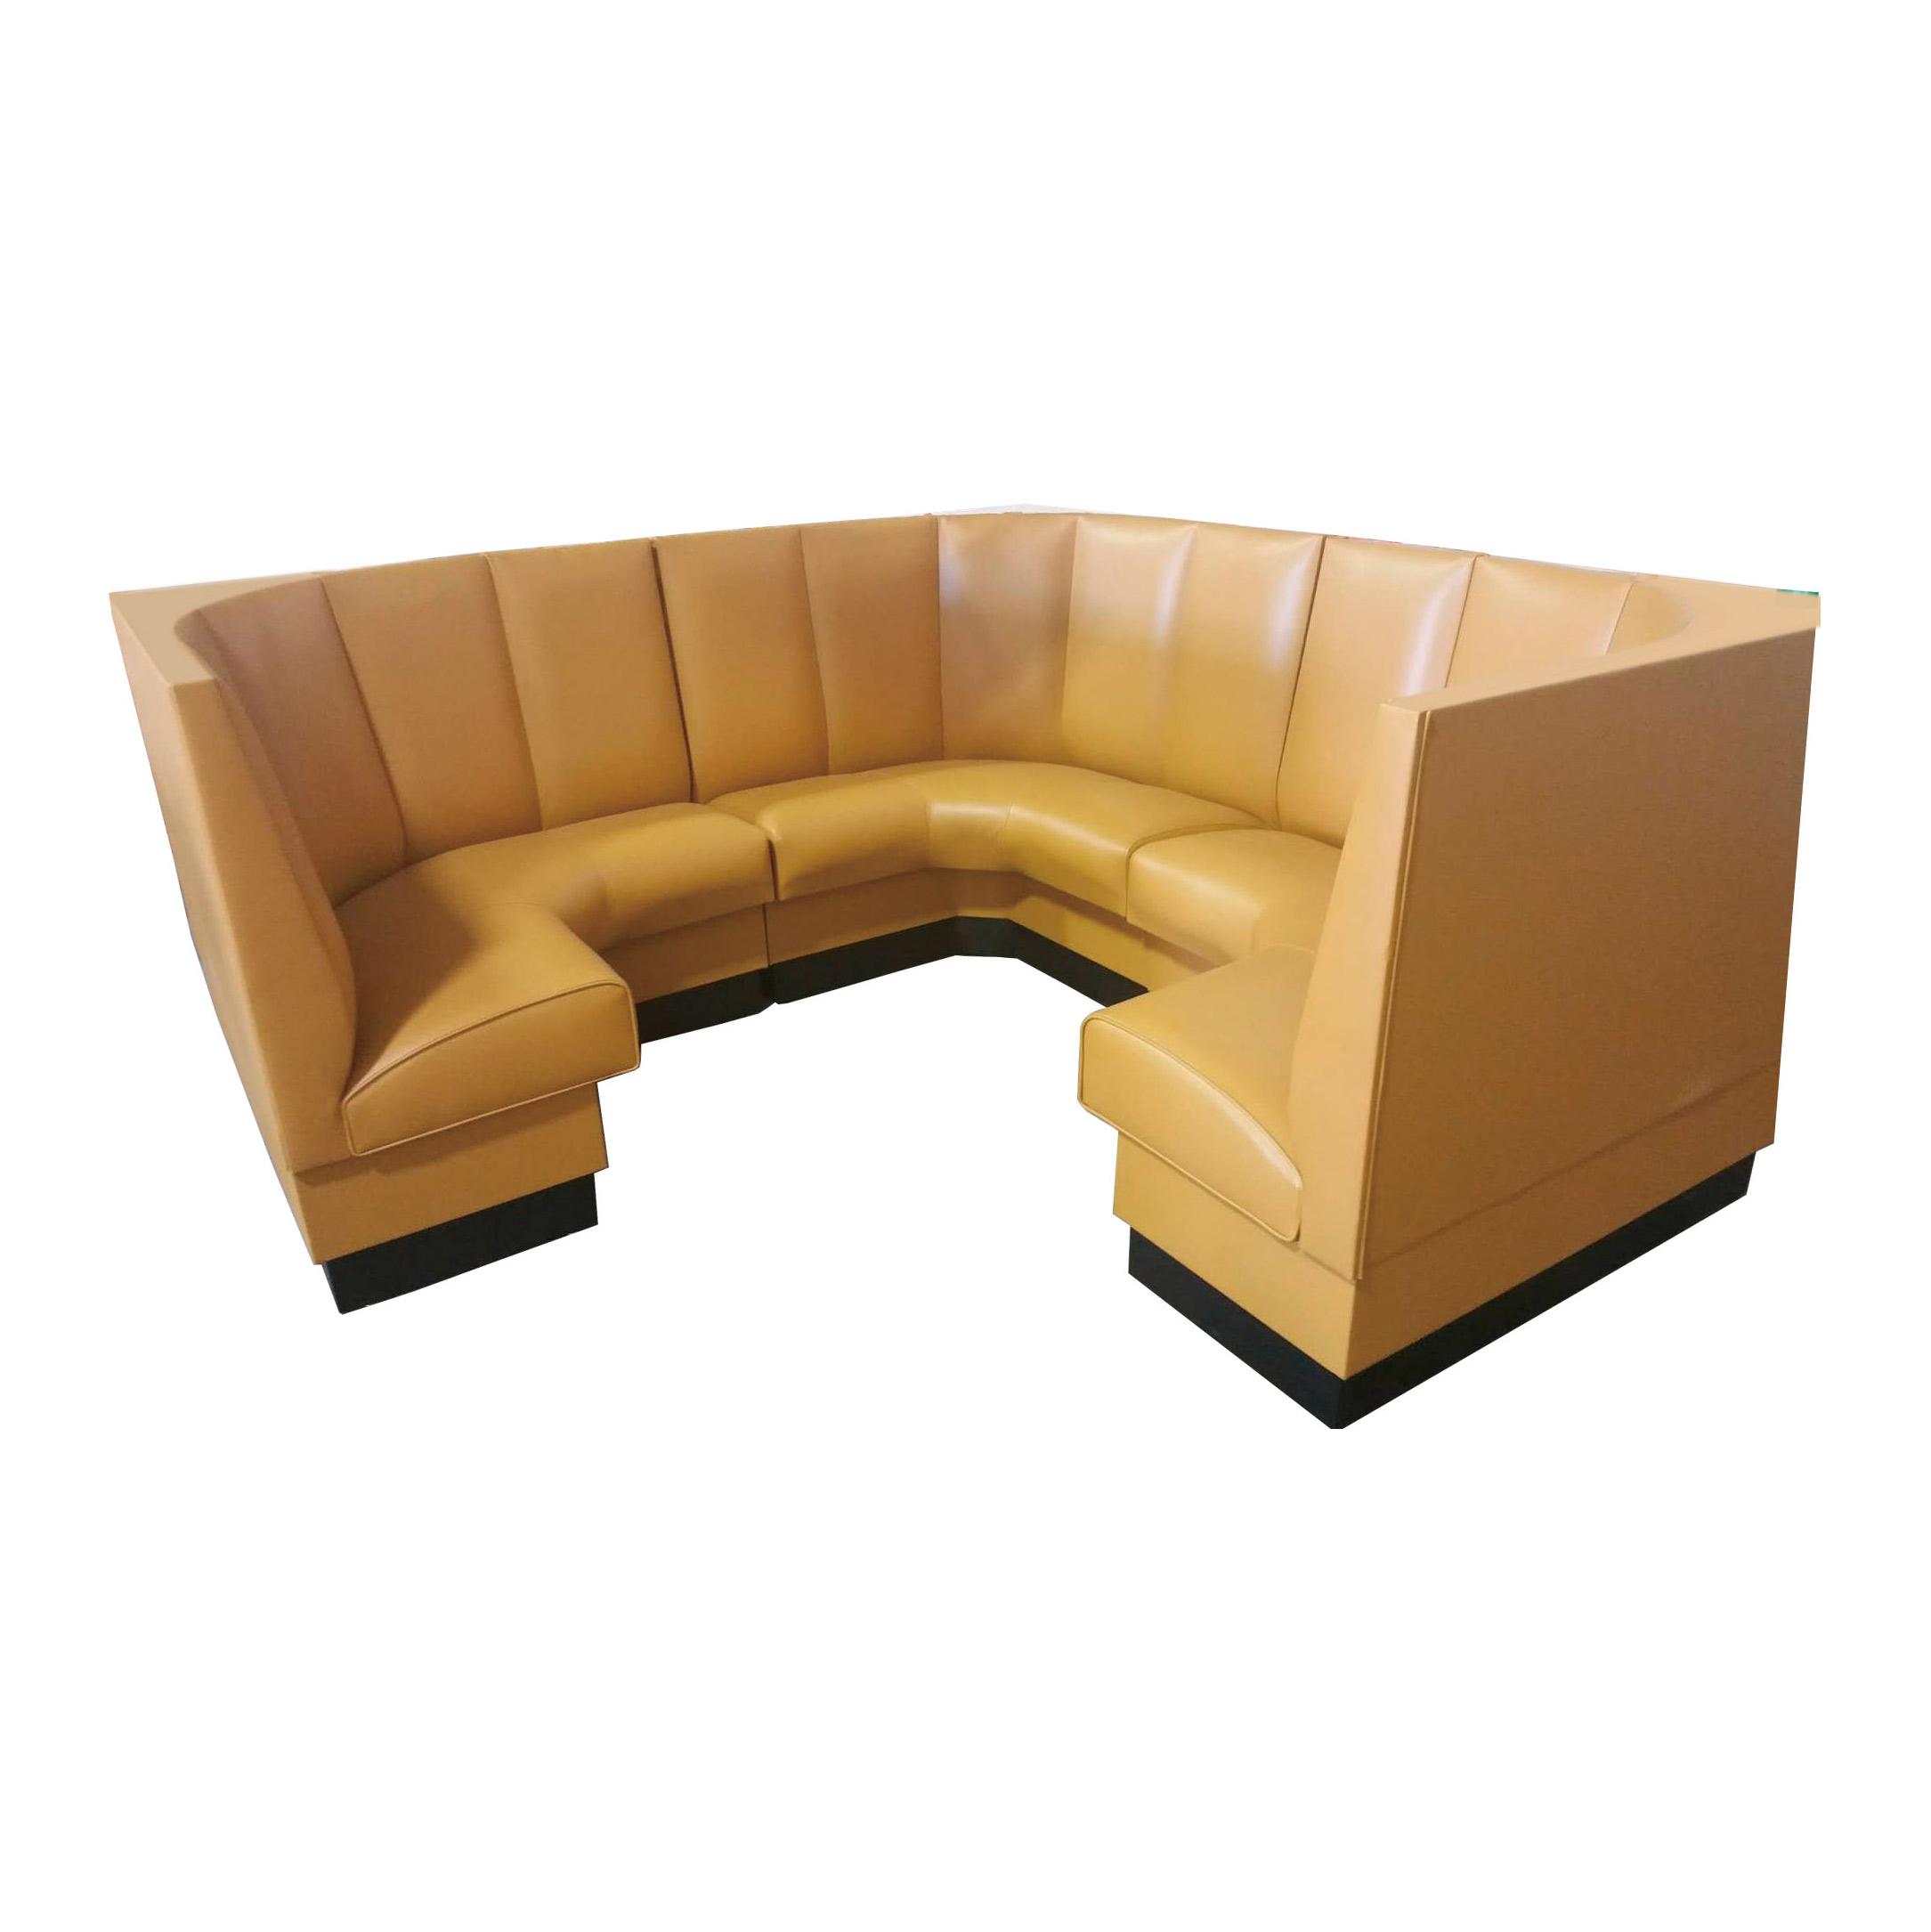 MKLD Furniture 36-V3CB-3/4C booth